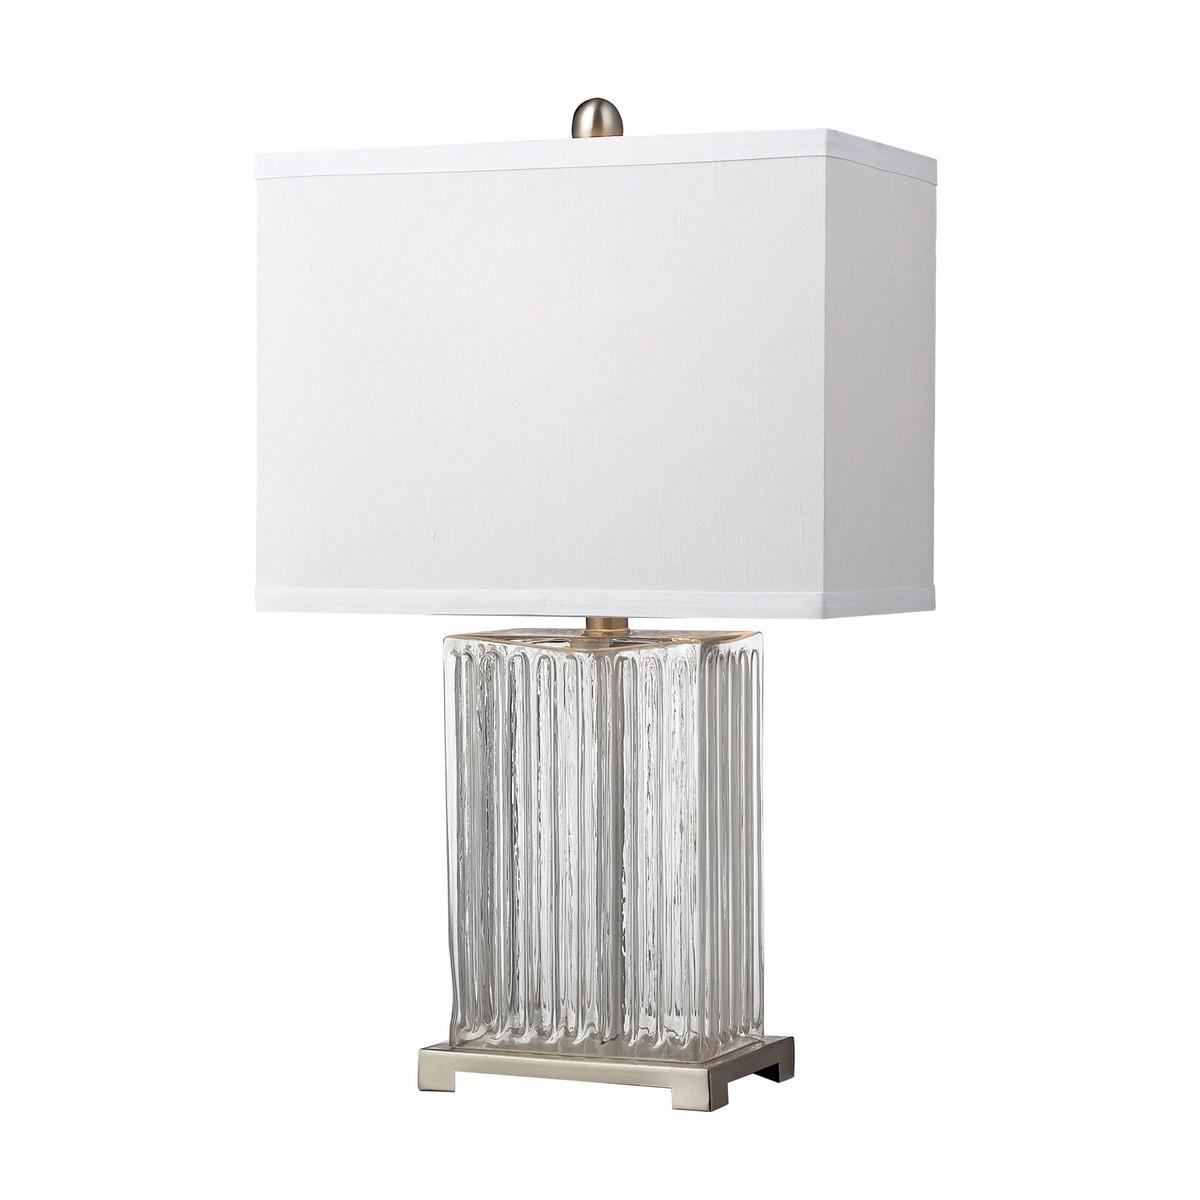 Elk Lighting D140 Table Lamp - Clear Color